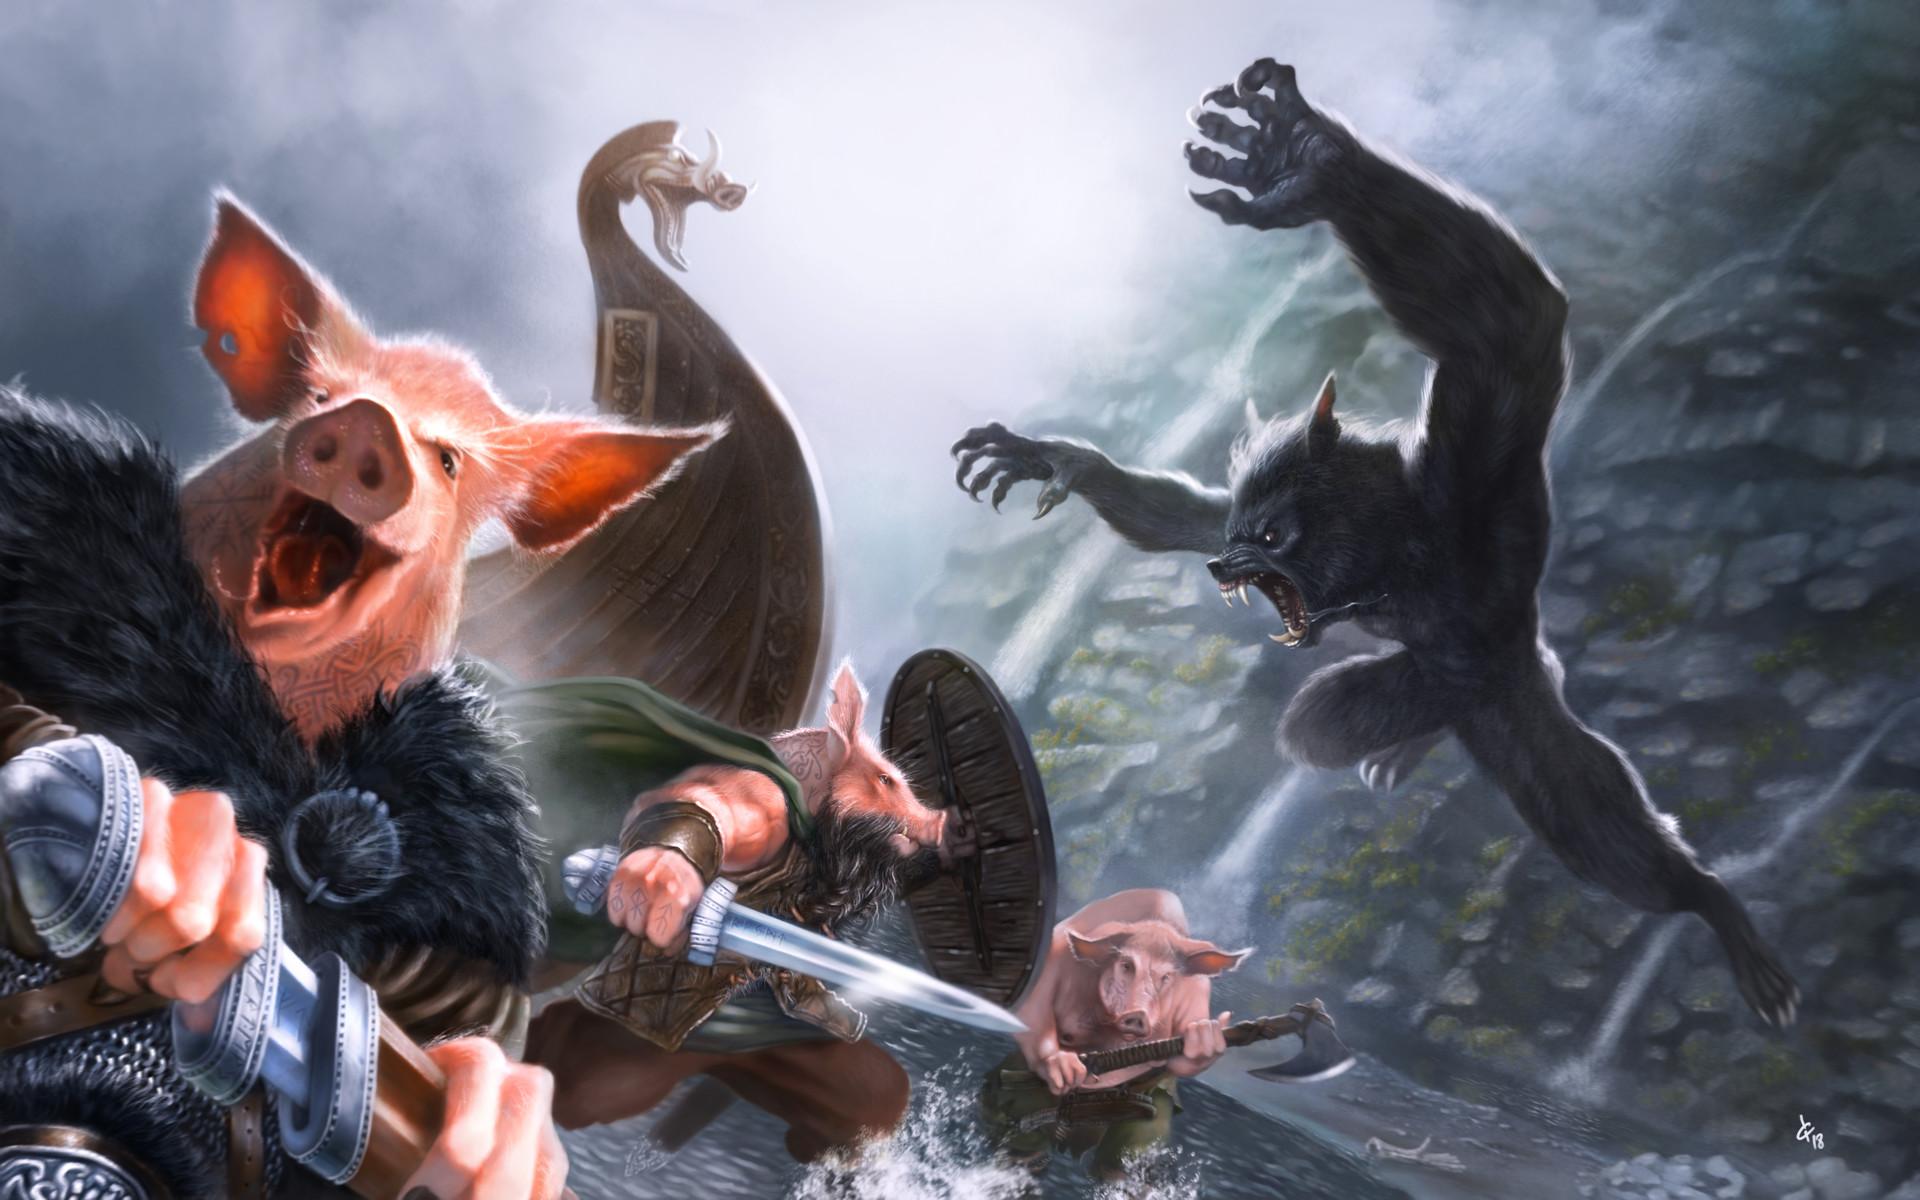 Loic canavaggia les 3 petits cochons vikings